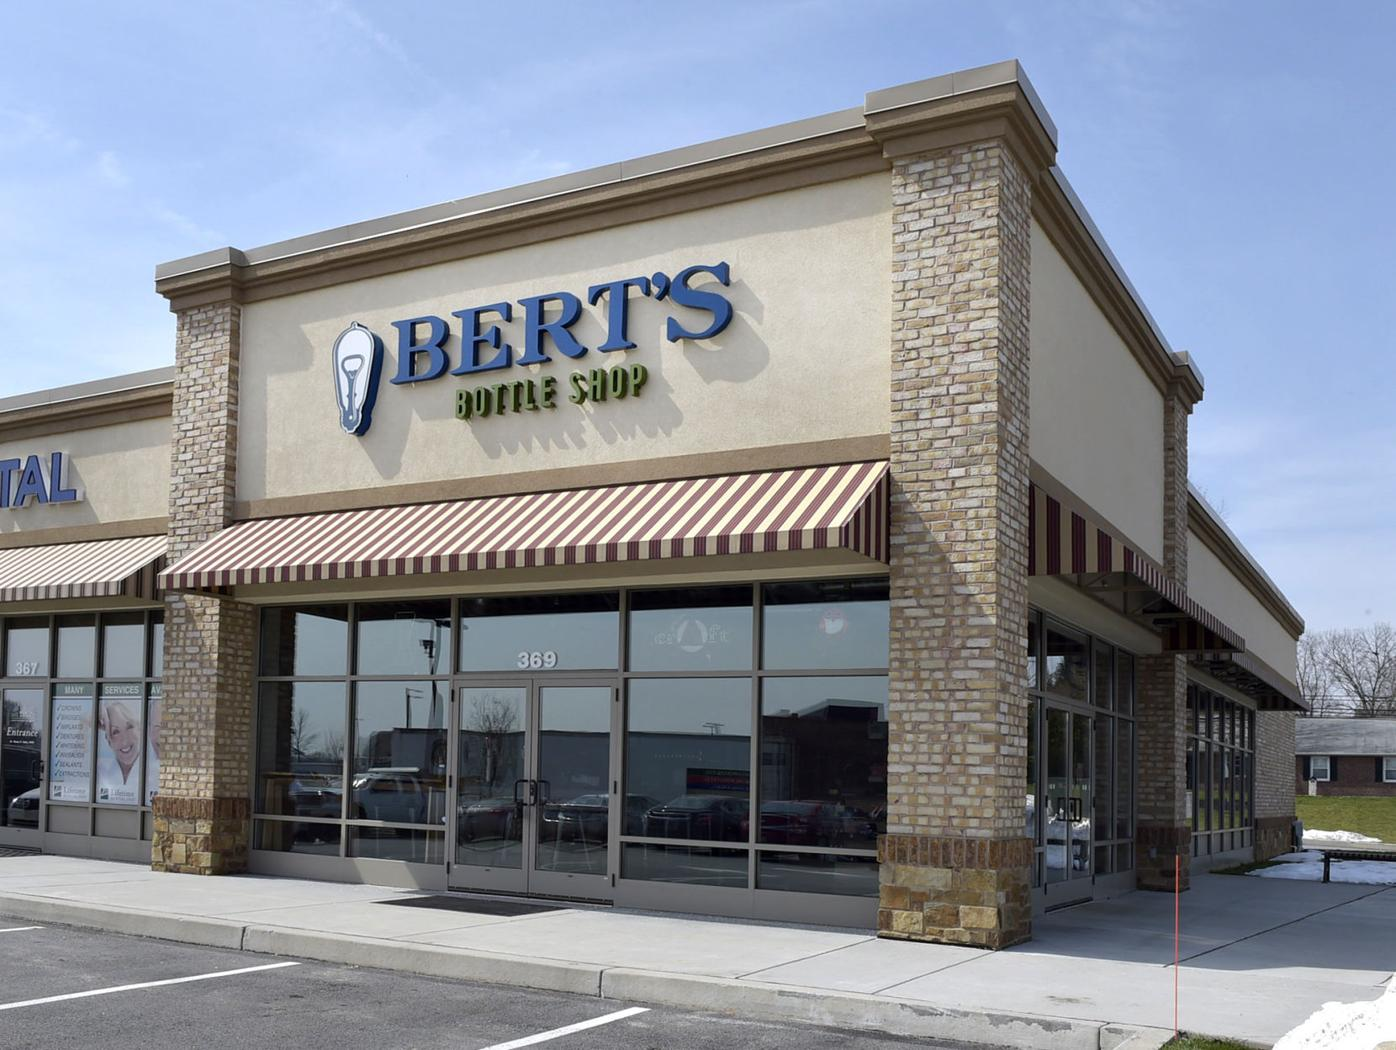 berts bottle shop01.jpg